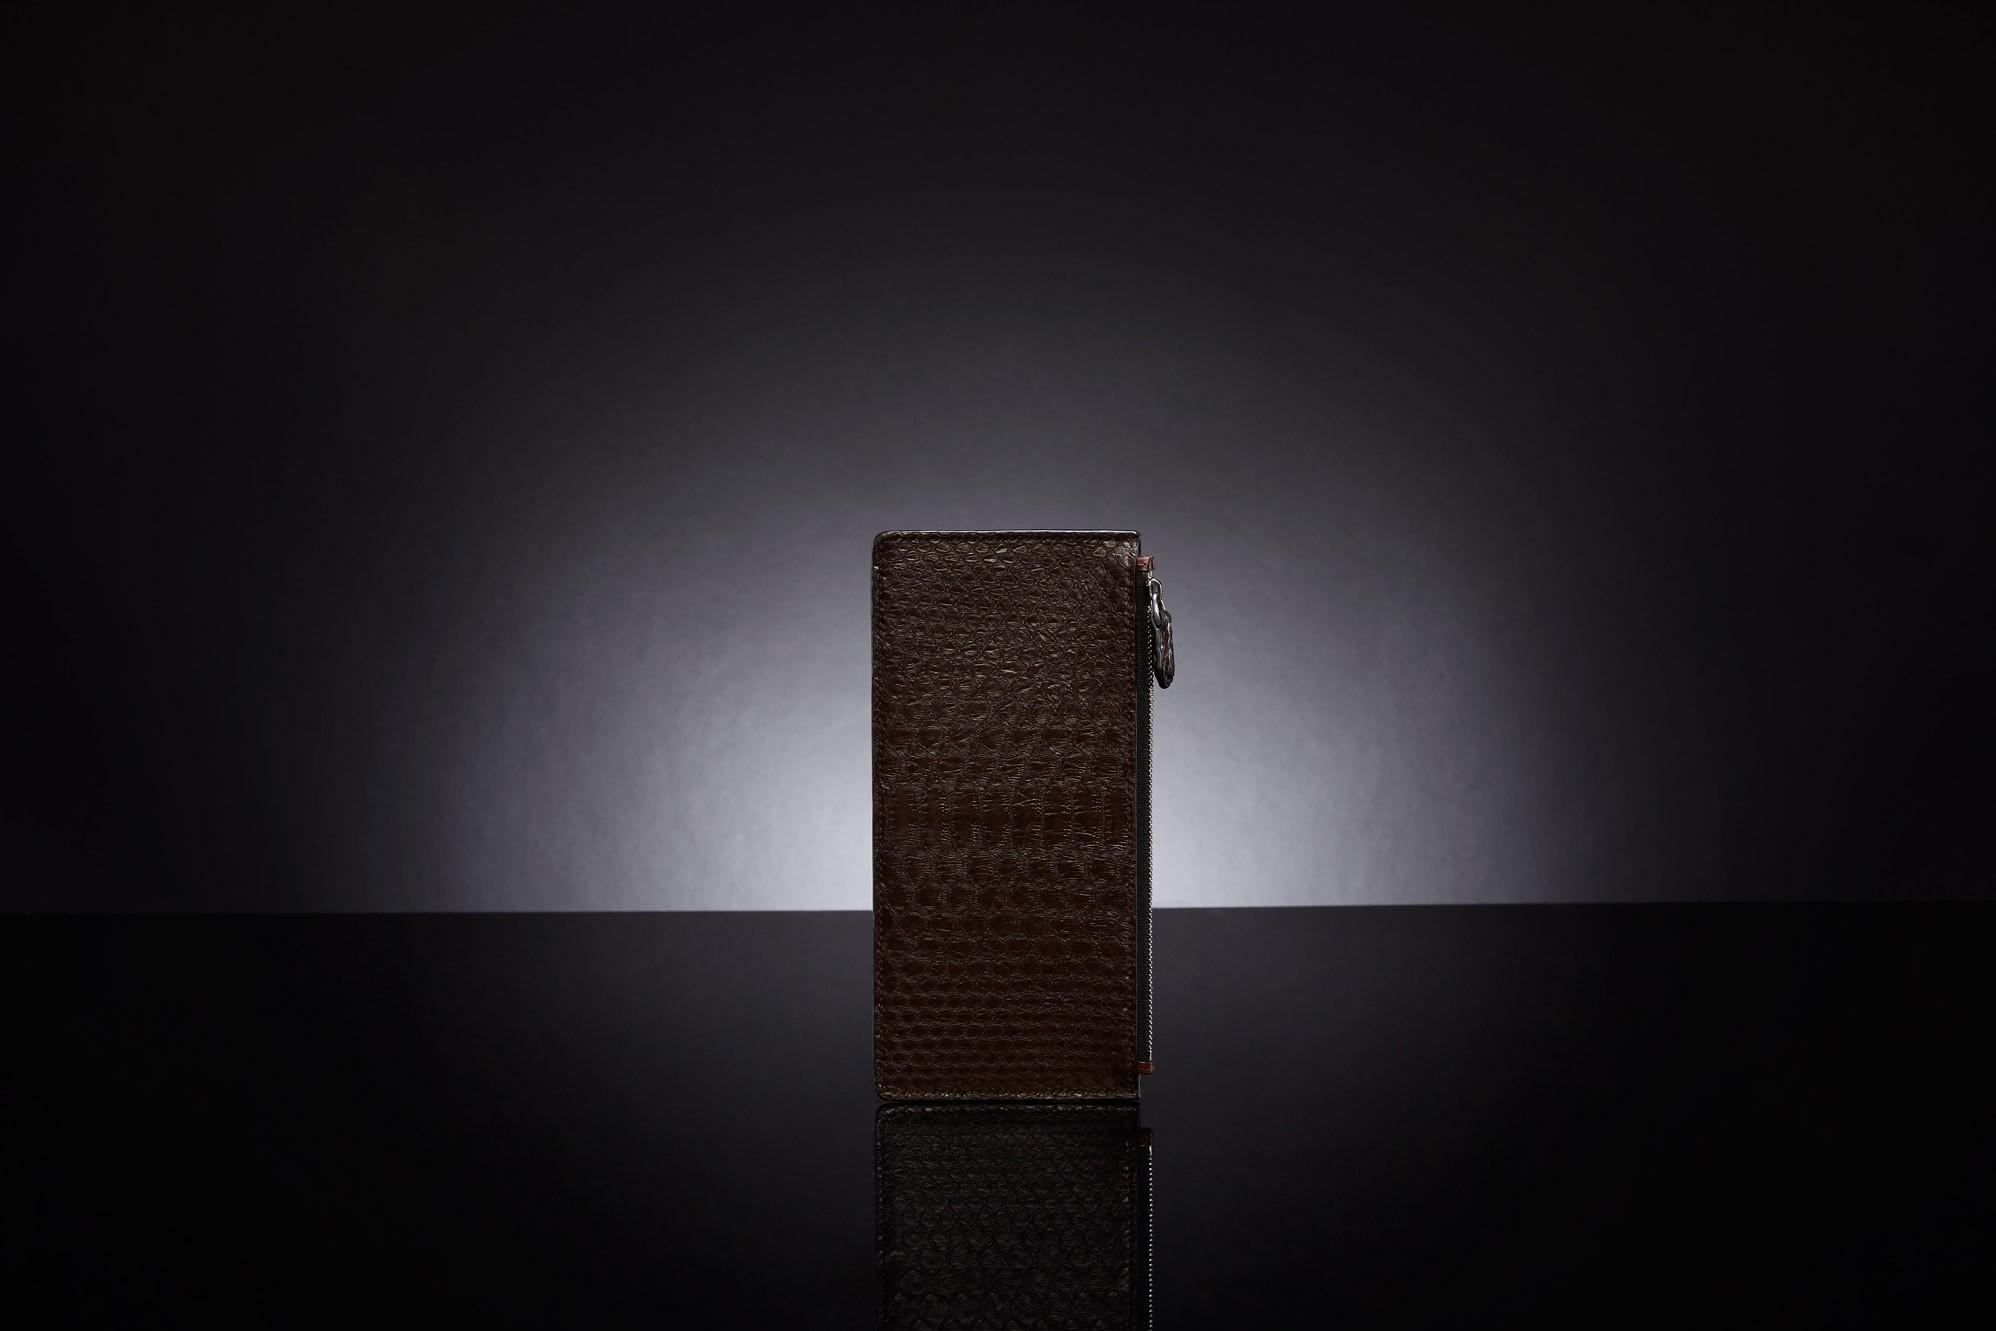 BRIE CARD HOLDER